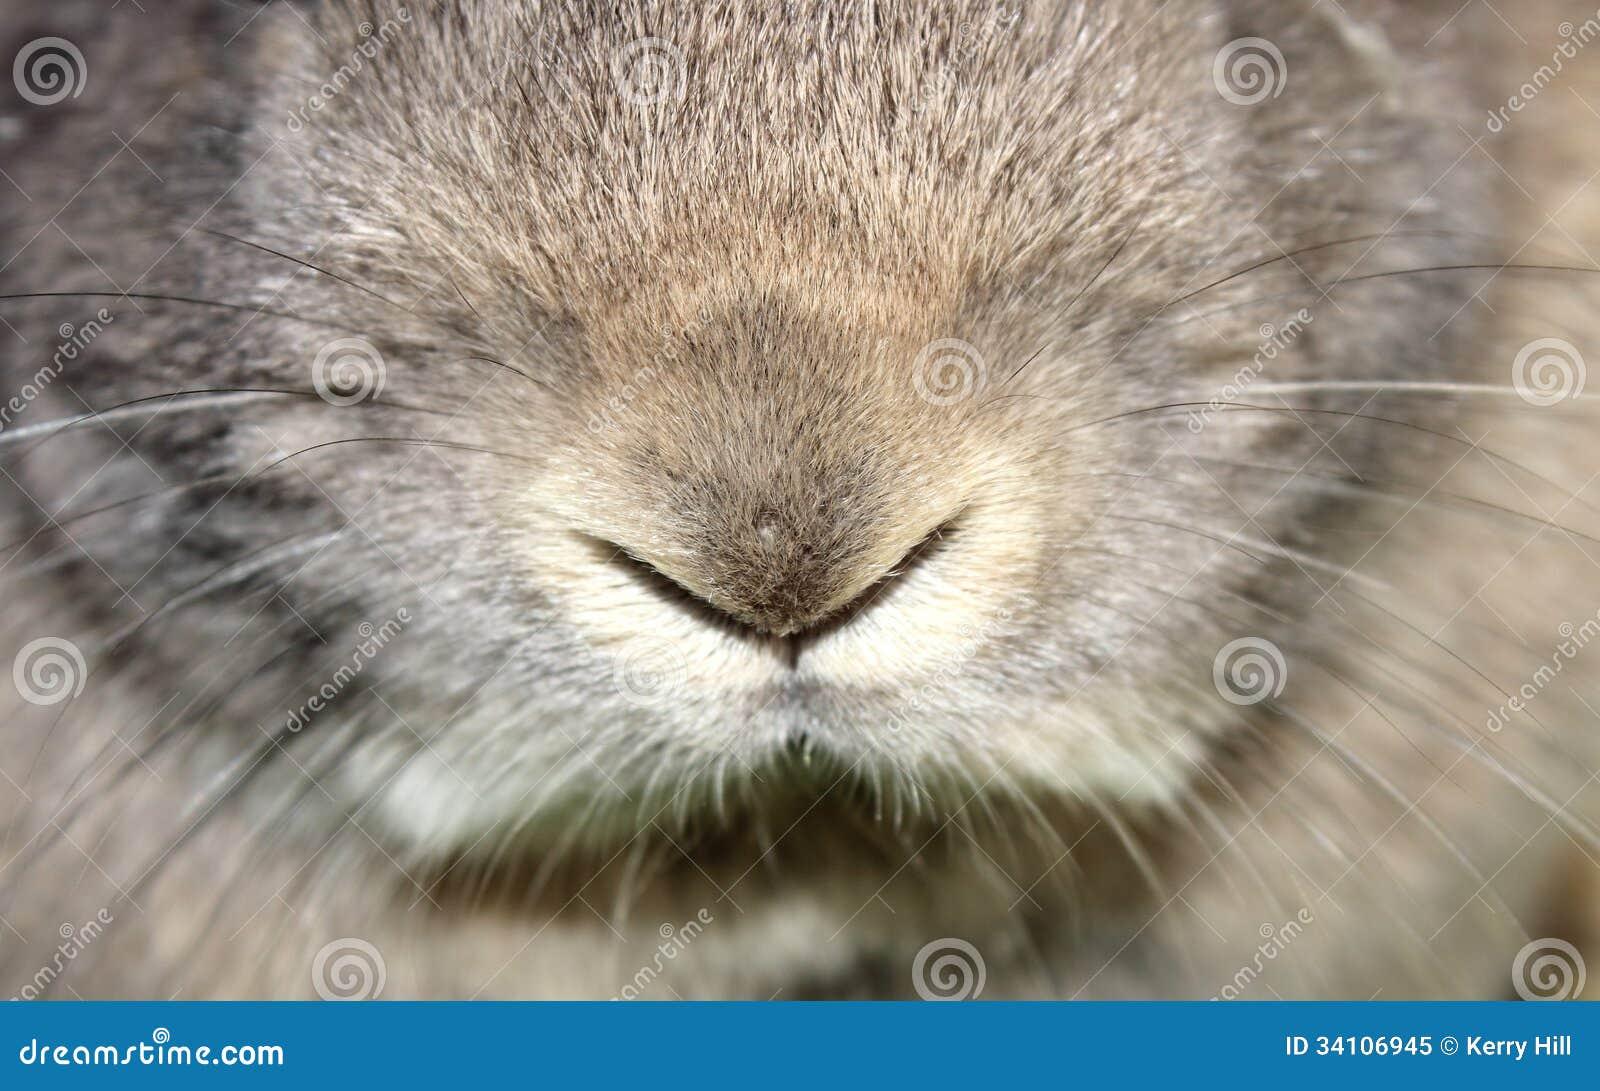 Rabbit Nose Royalty Free Stock Photo Image 34106945